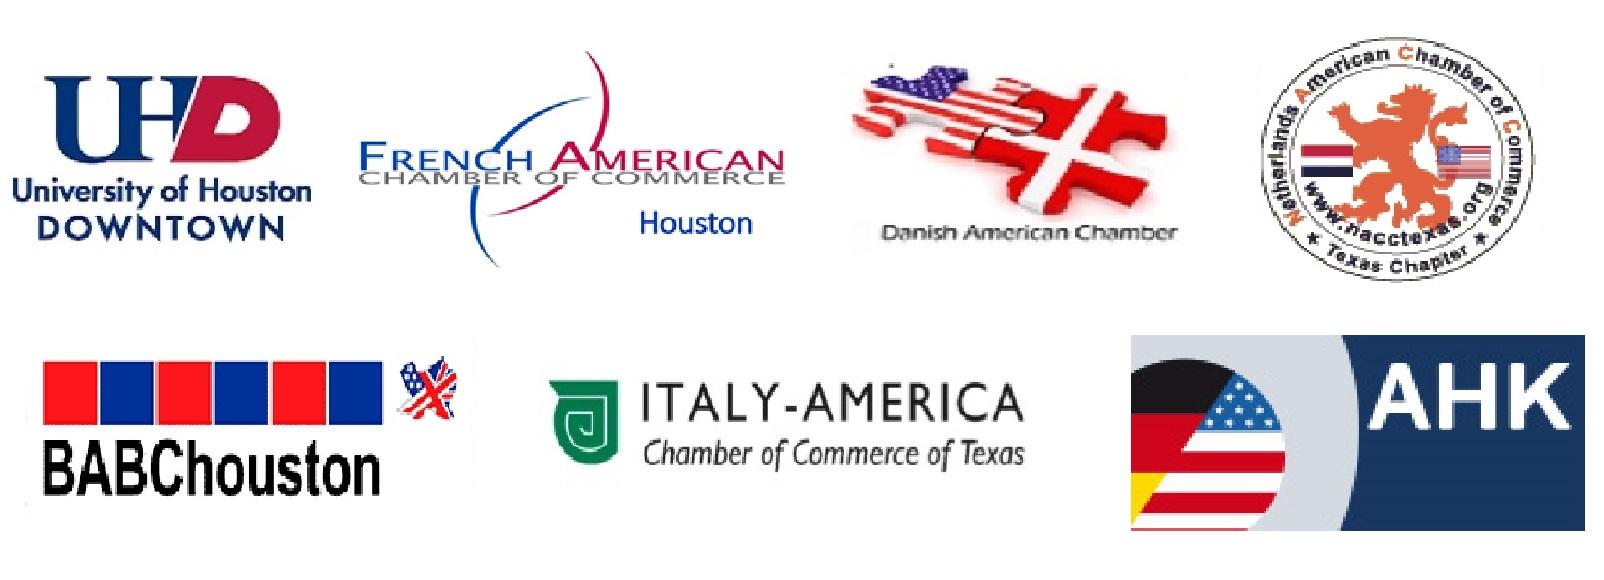 logos luncheon ambassador3 (2)